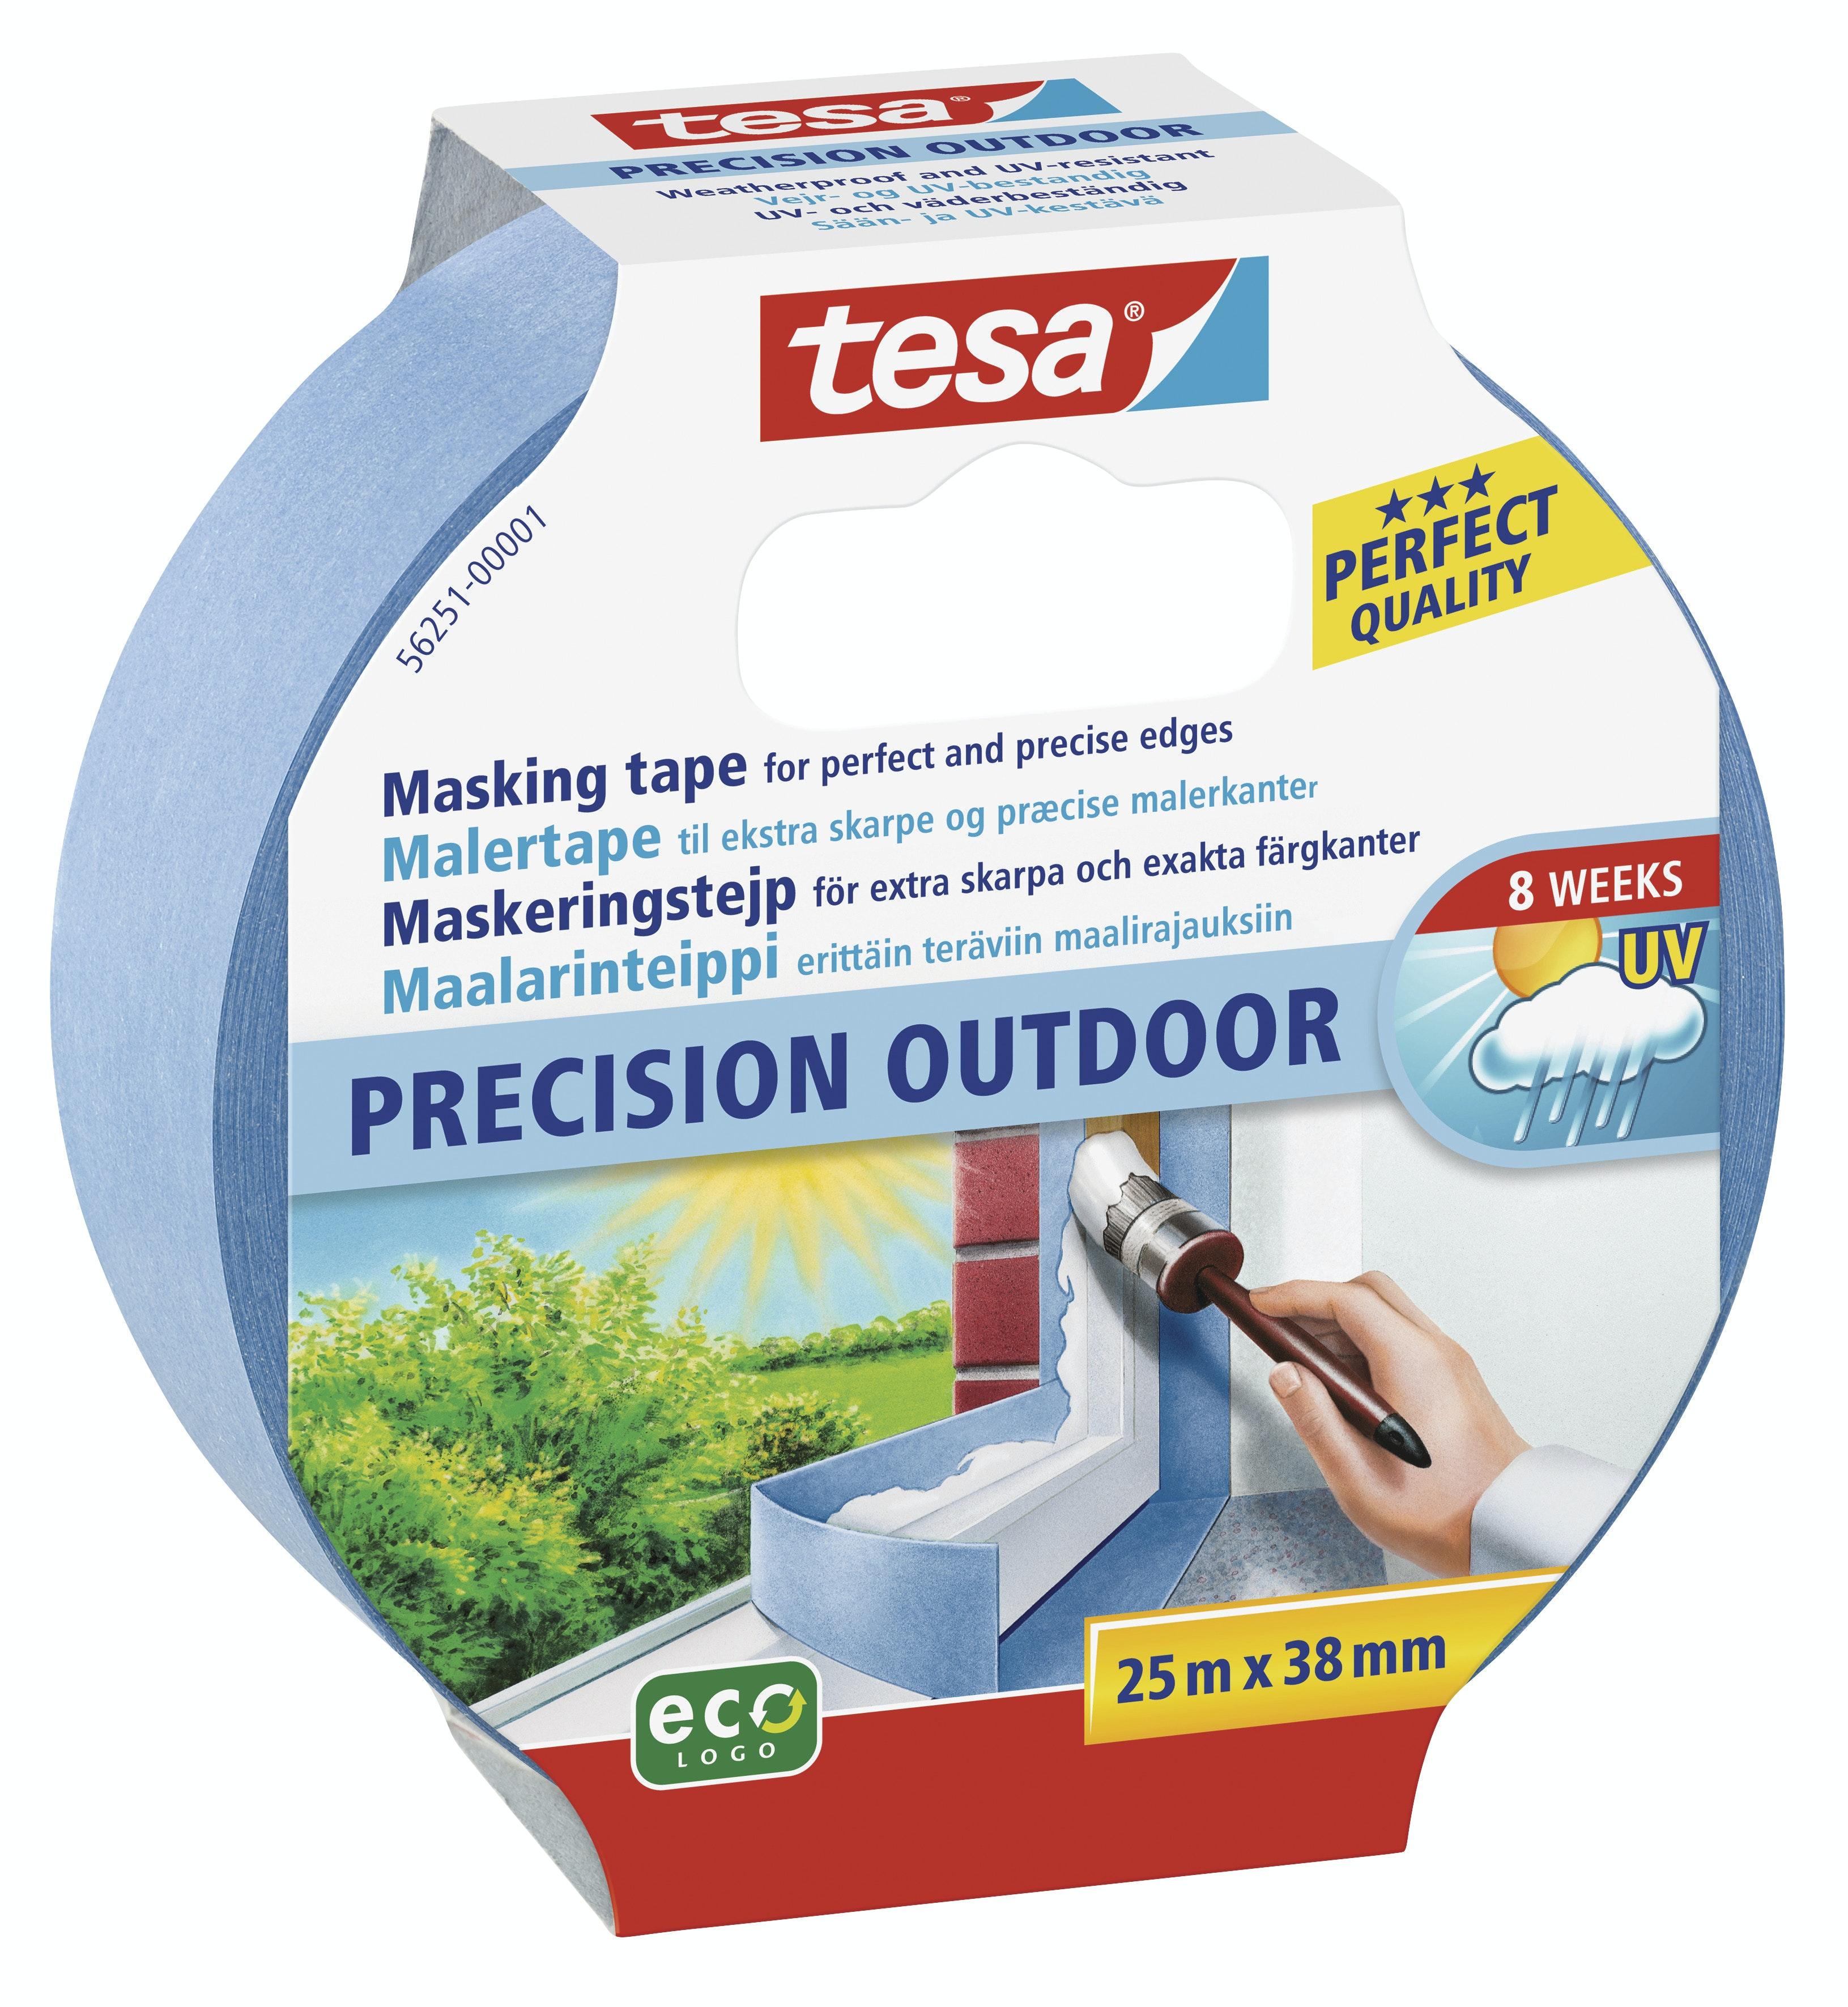 Maskeringstejp Tesa Precision Outdoor Blå 38mmx25m